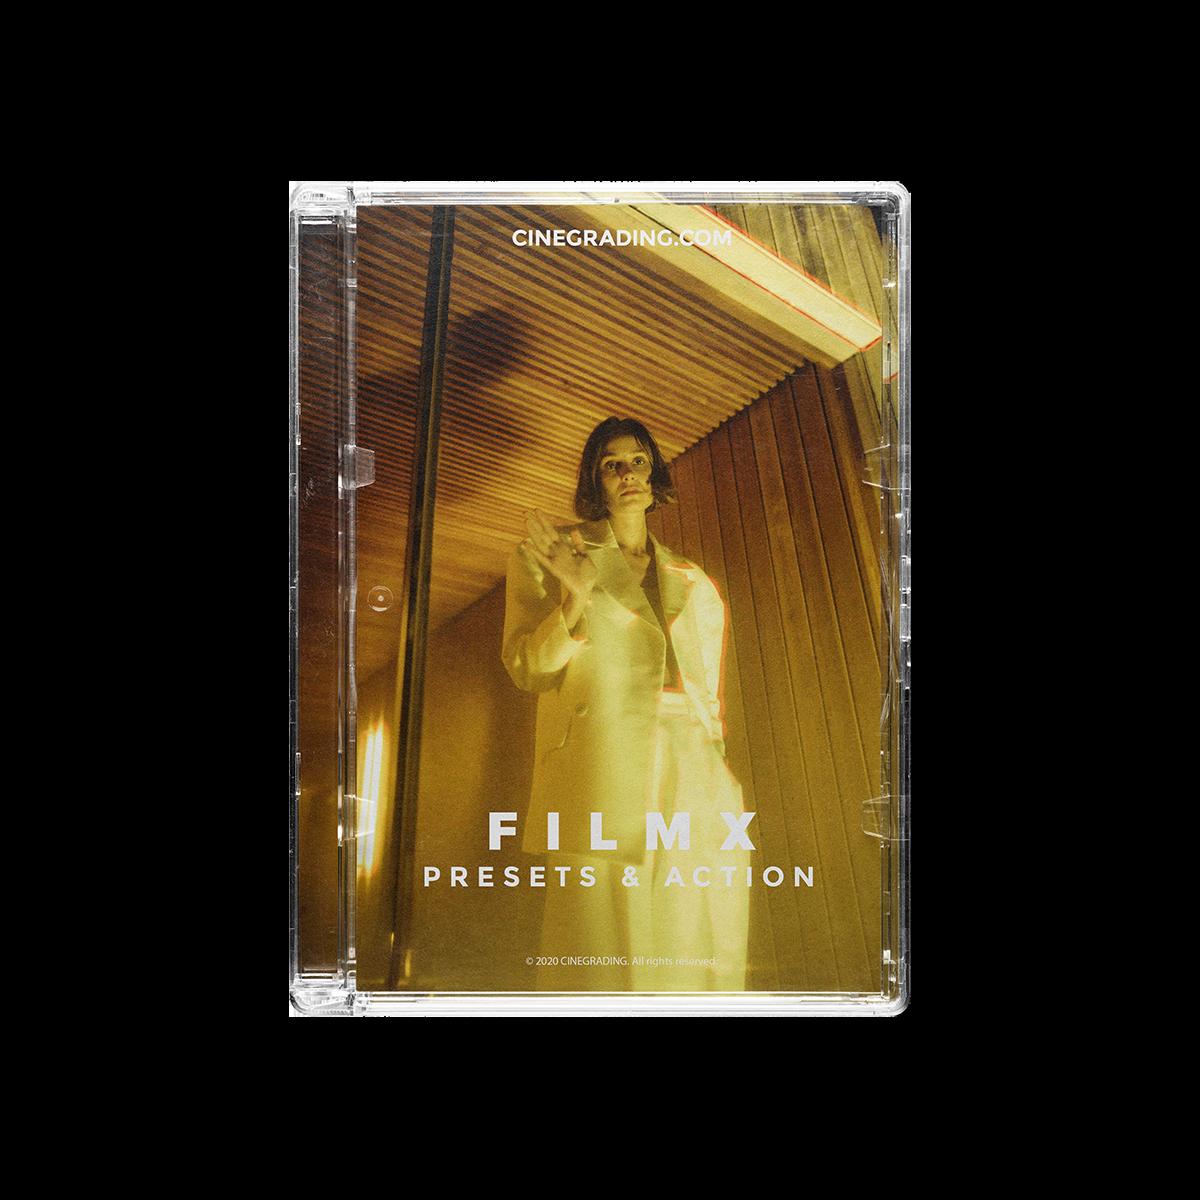 CINE FILMX PRESETS & ACTION